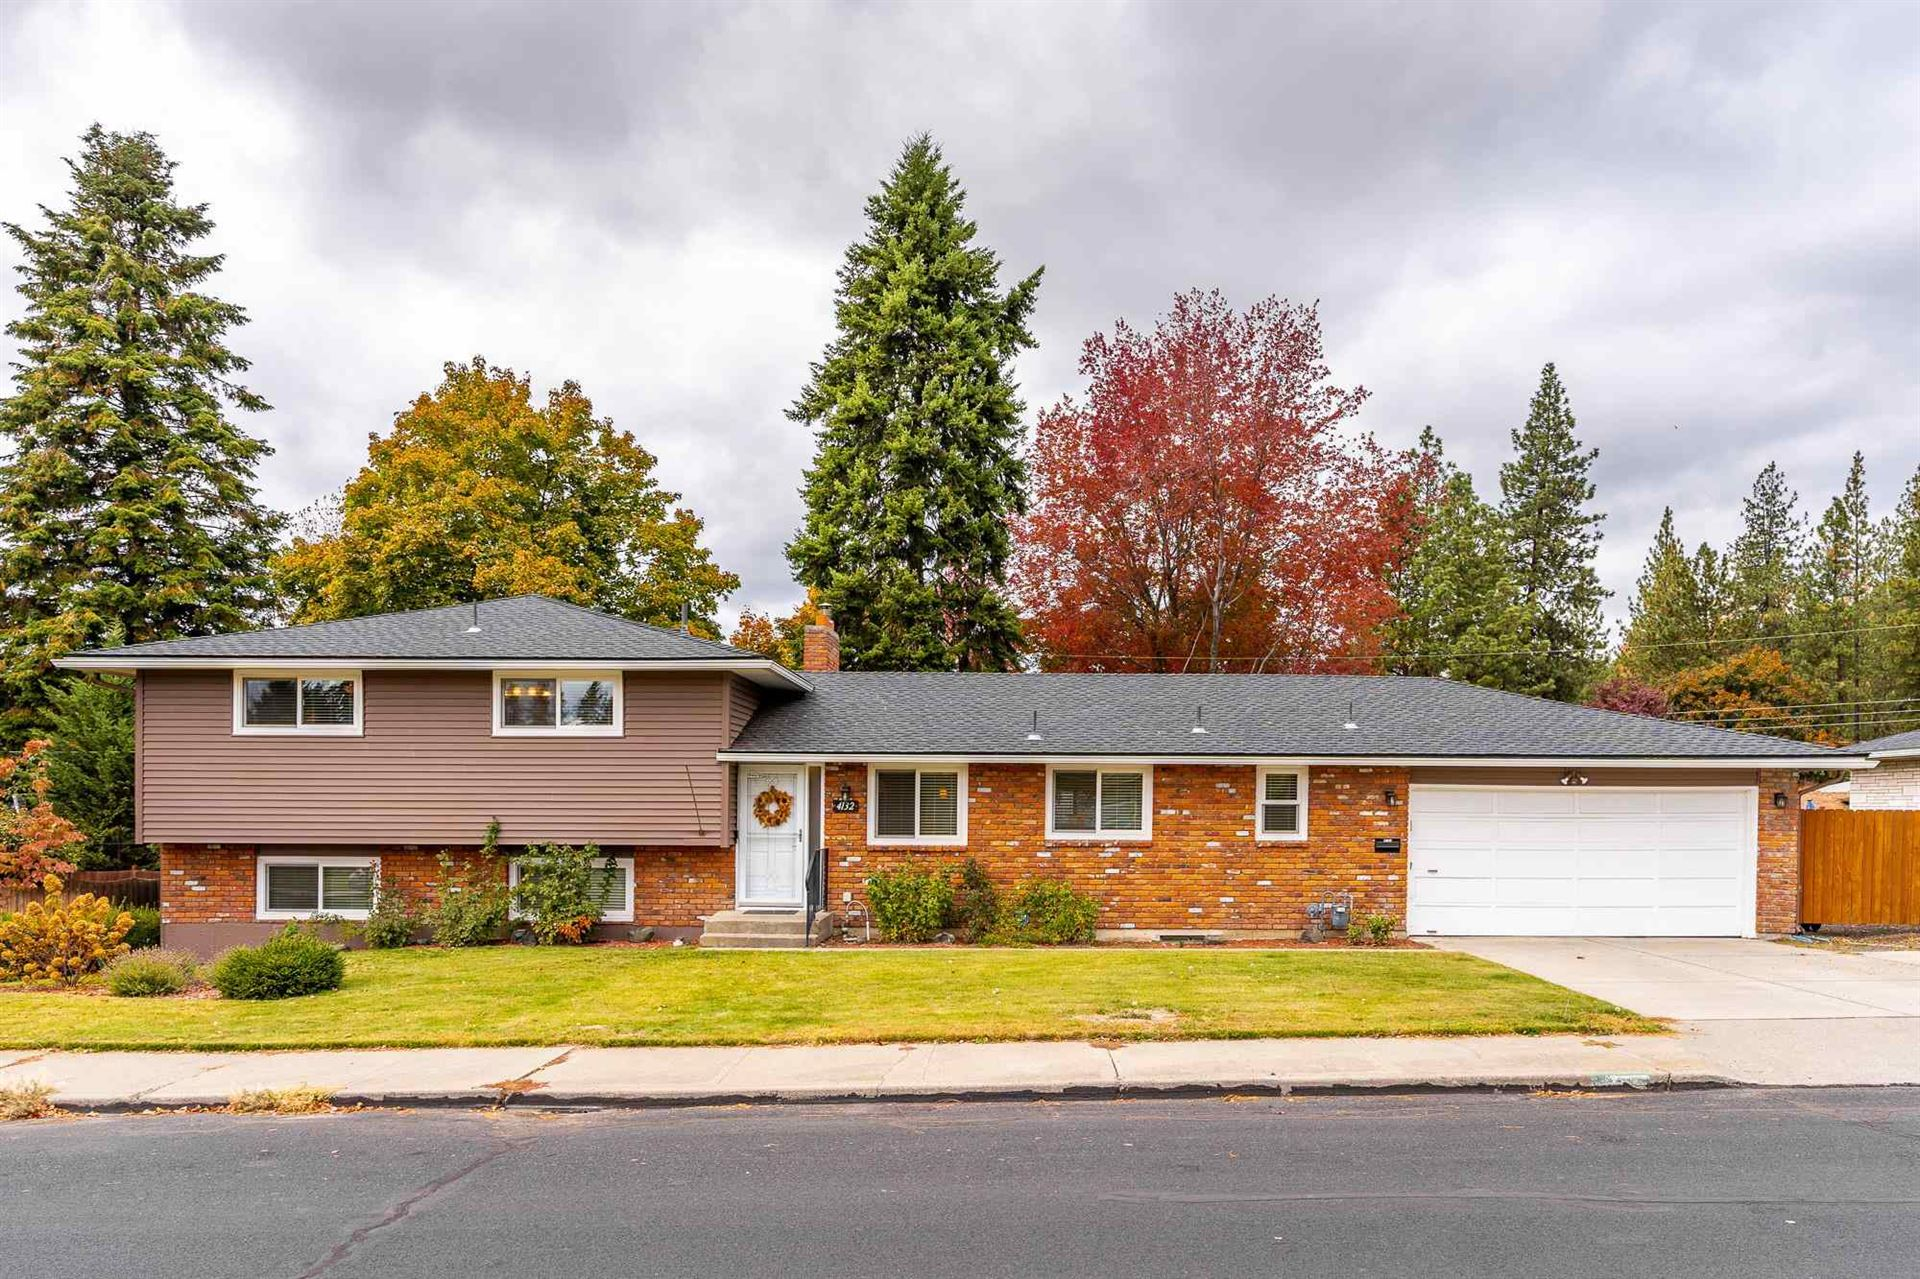 4132 W Kathleen Ave, Spokane, WA 99208 - #: 202123981